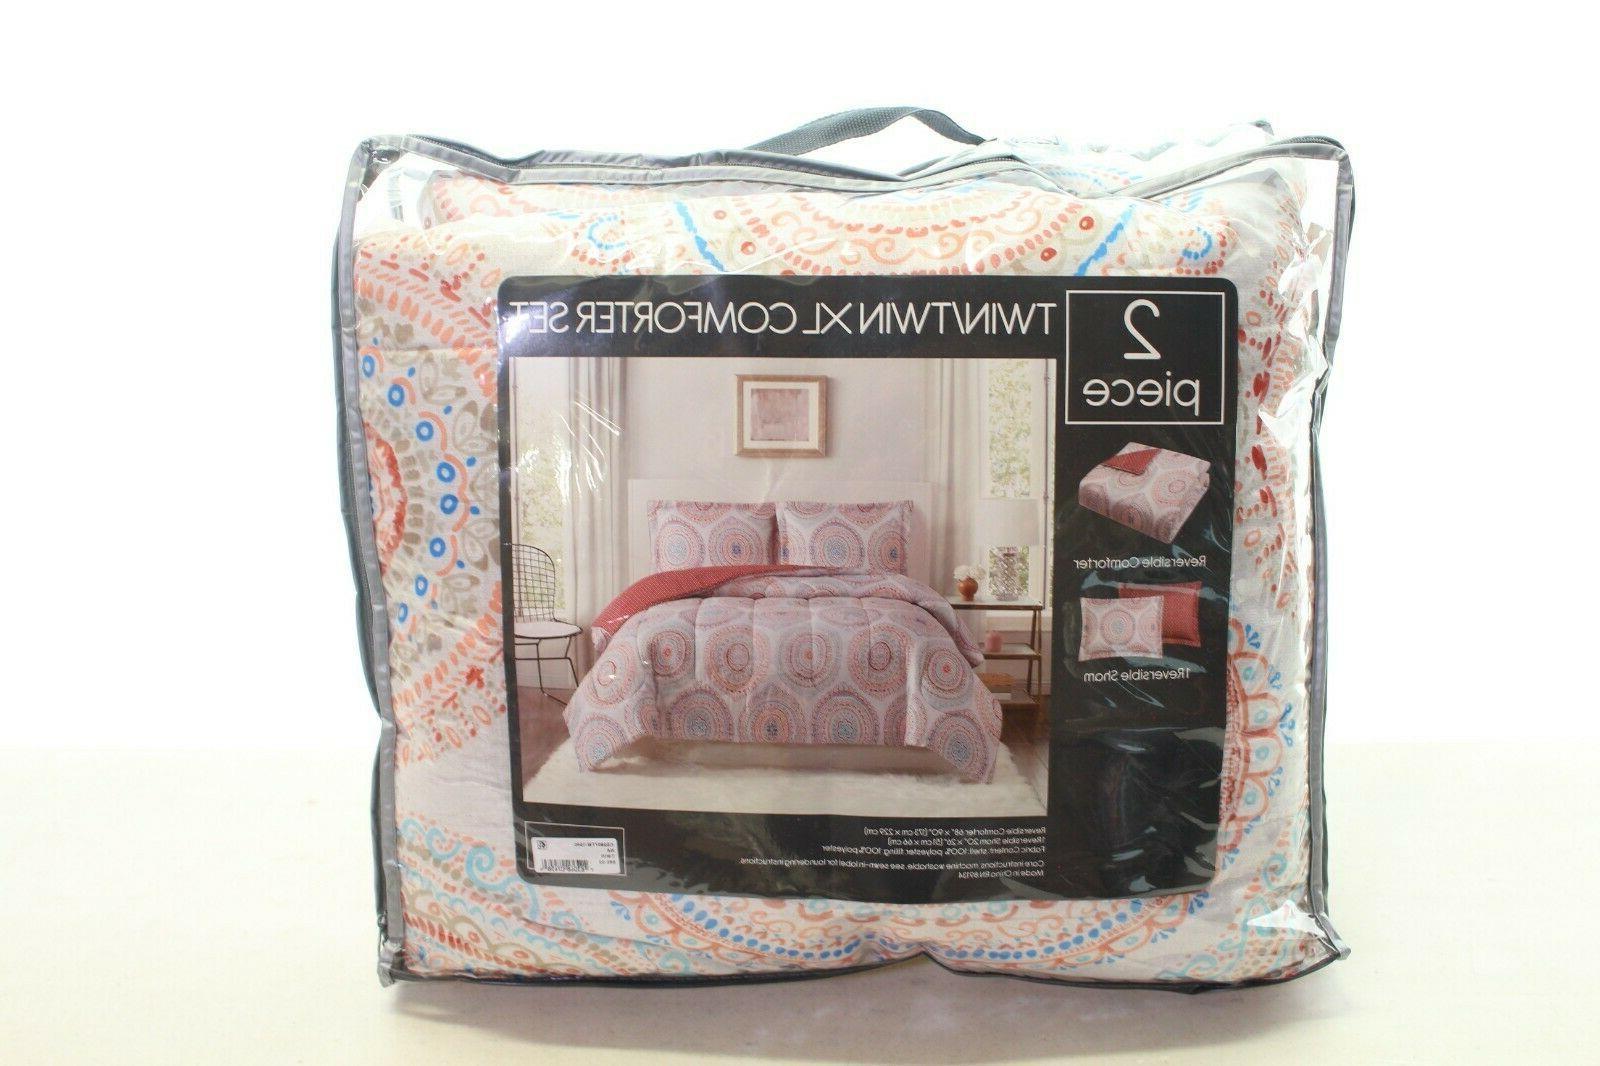 Pem 2 Twin/Twin XL Comforter Modern